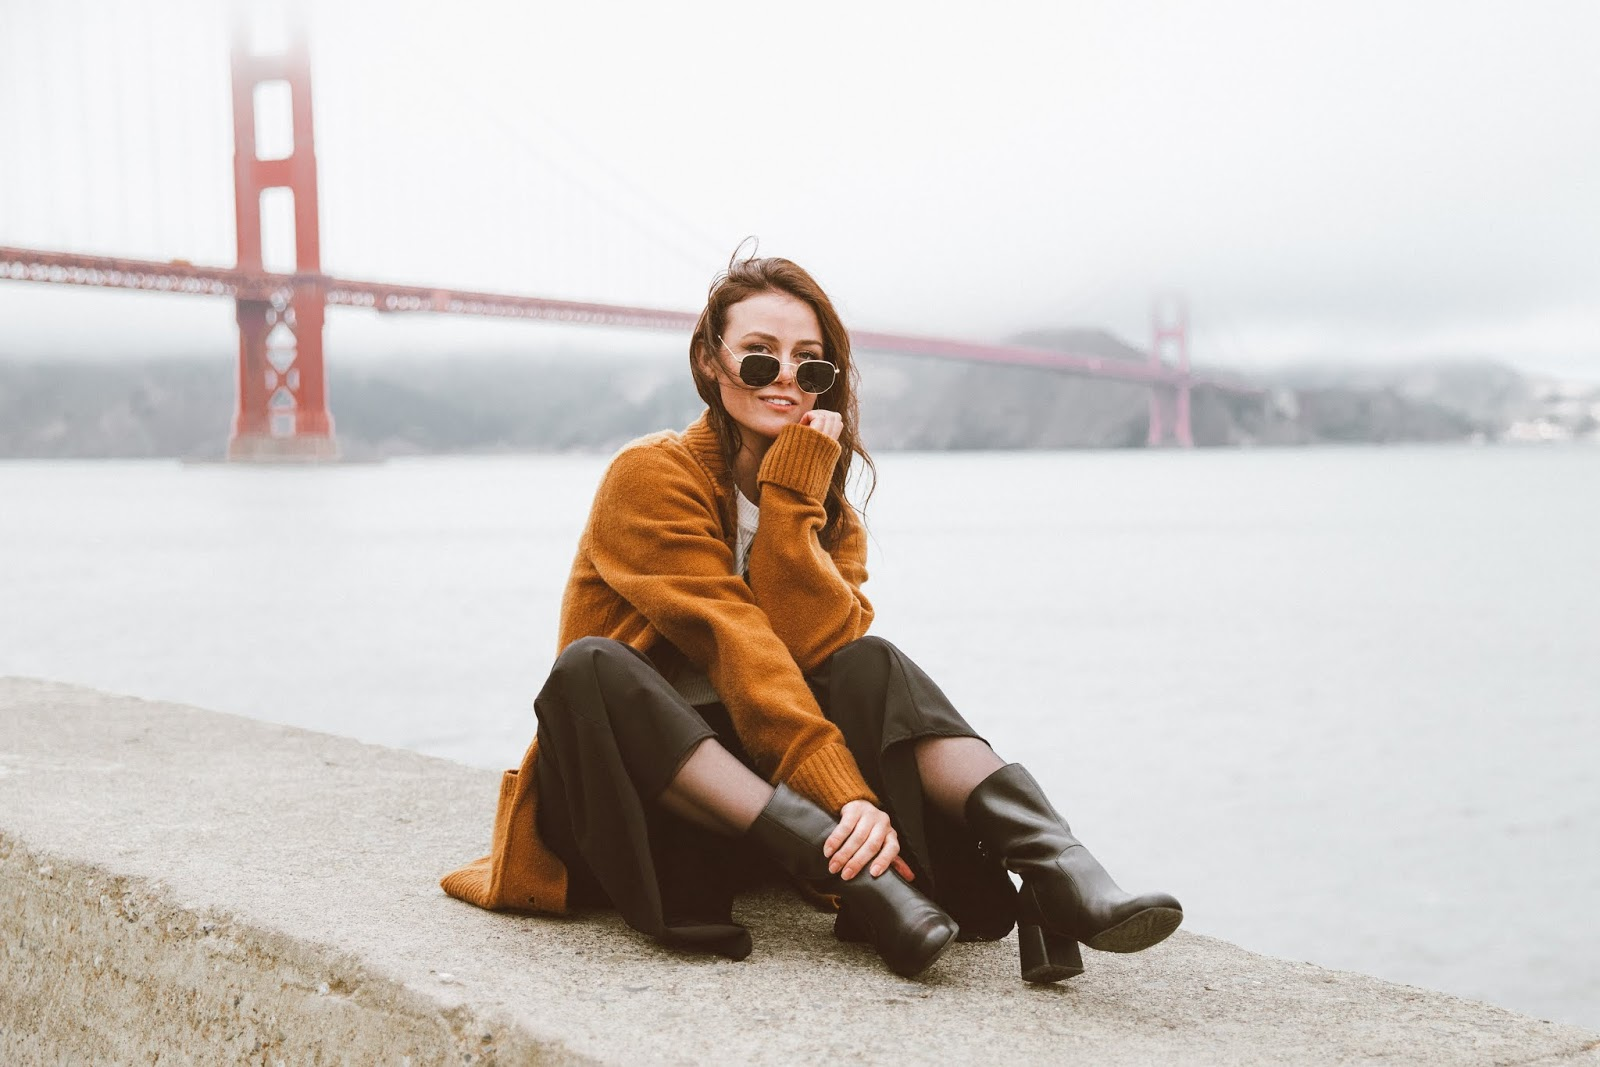 shelly stuckman, ArizonaGirl.com, San Francisco, travel blog, fashion blogger, Golden Gate Bridge